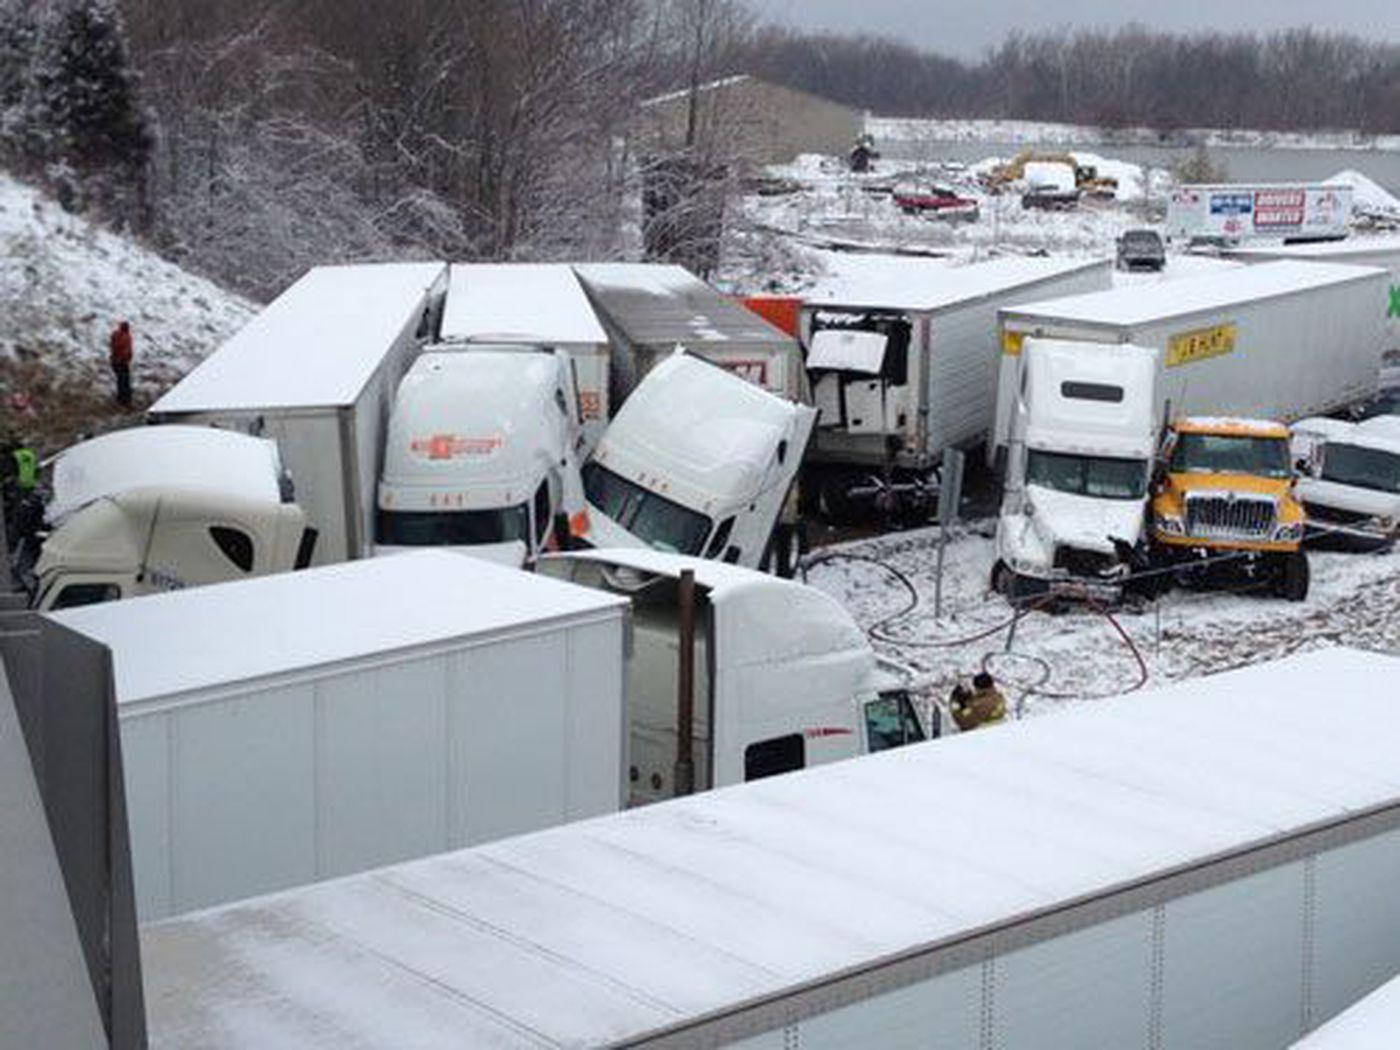 40-car pileup closes I-70 west of Indianapolis